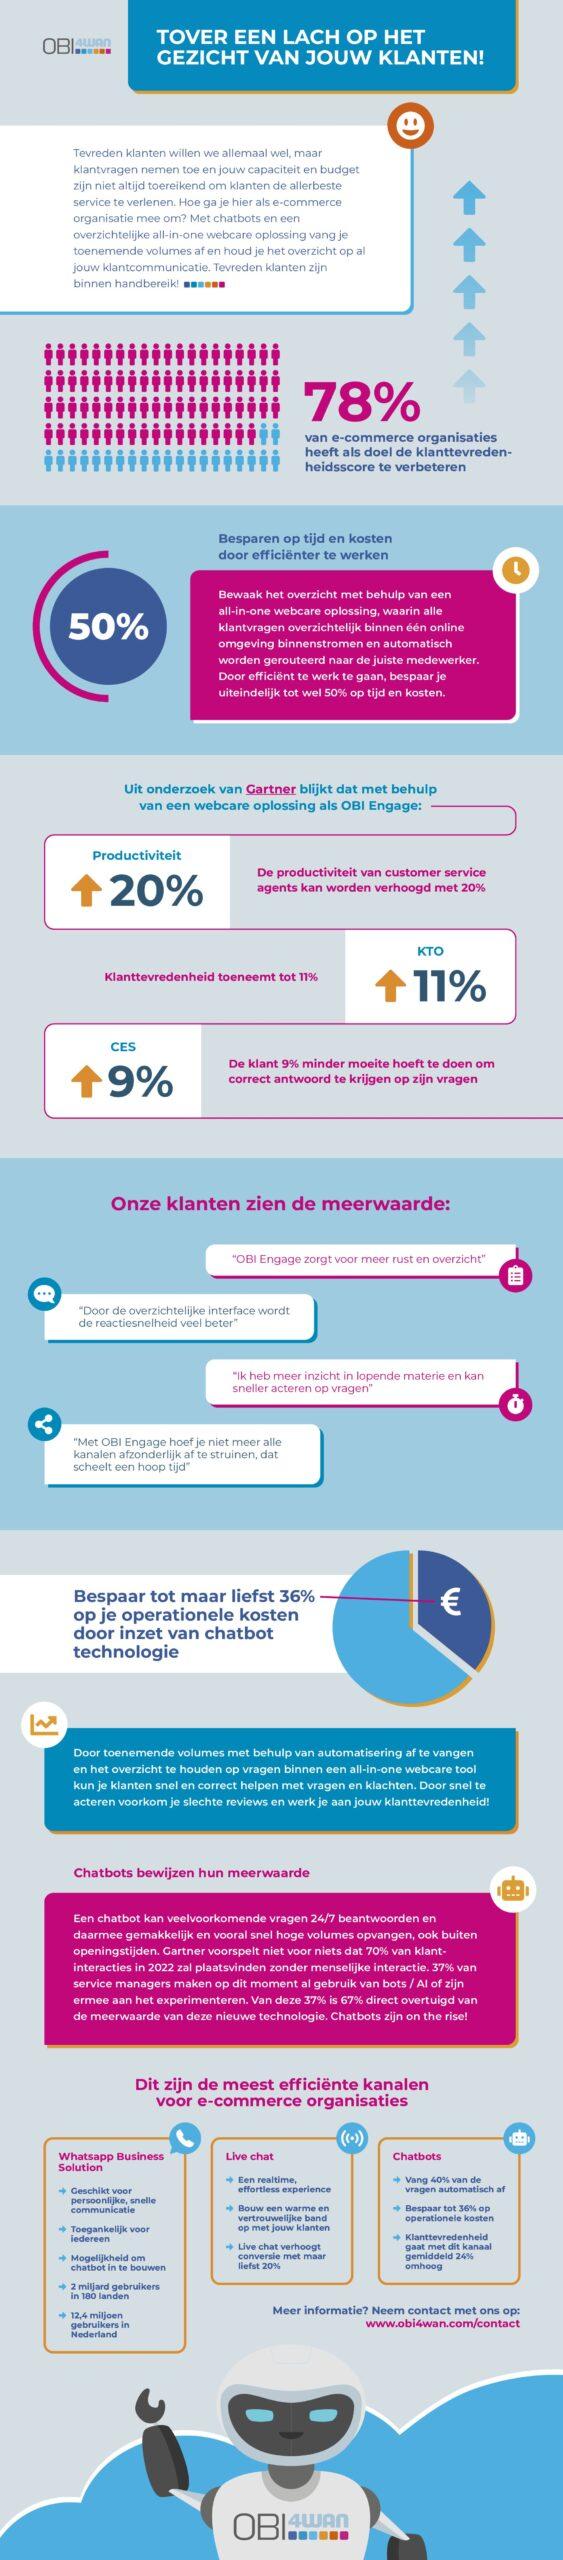 Infographic E-comm | OBI4wan